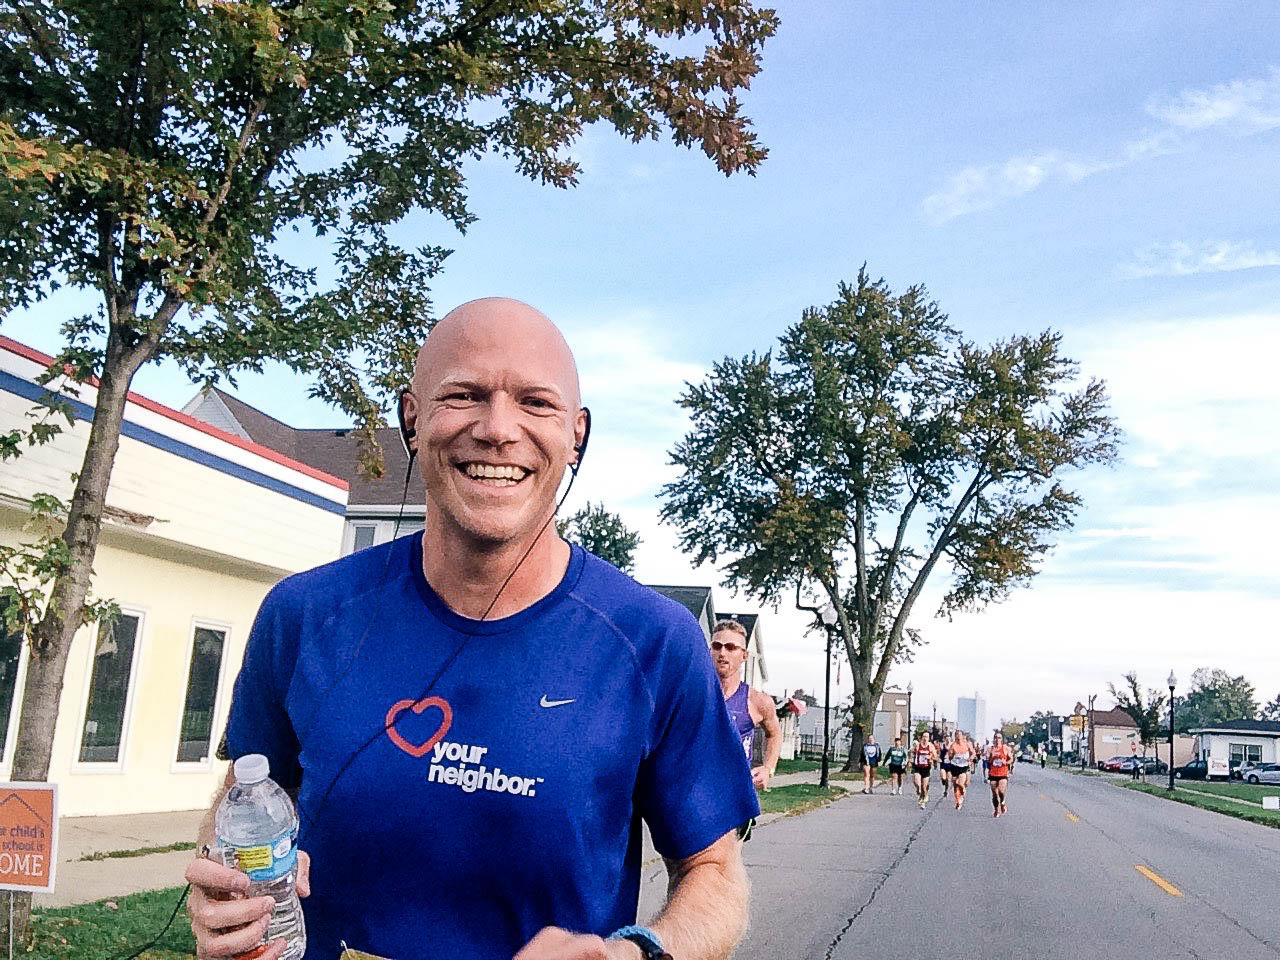 Matt is big supporter of Team NeighborLink and an avid runner.